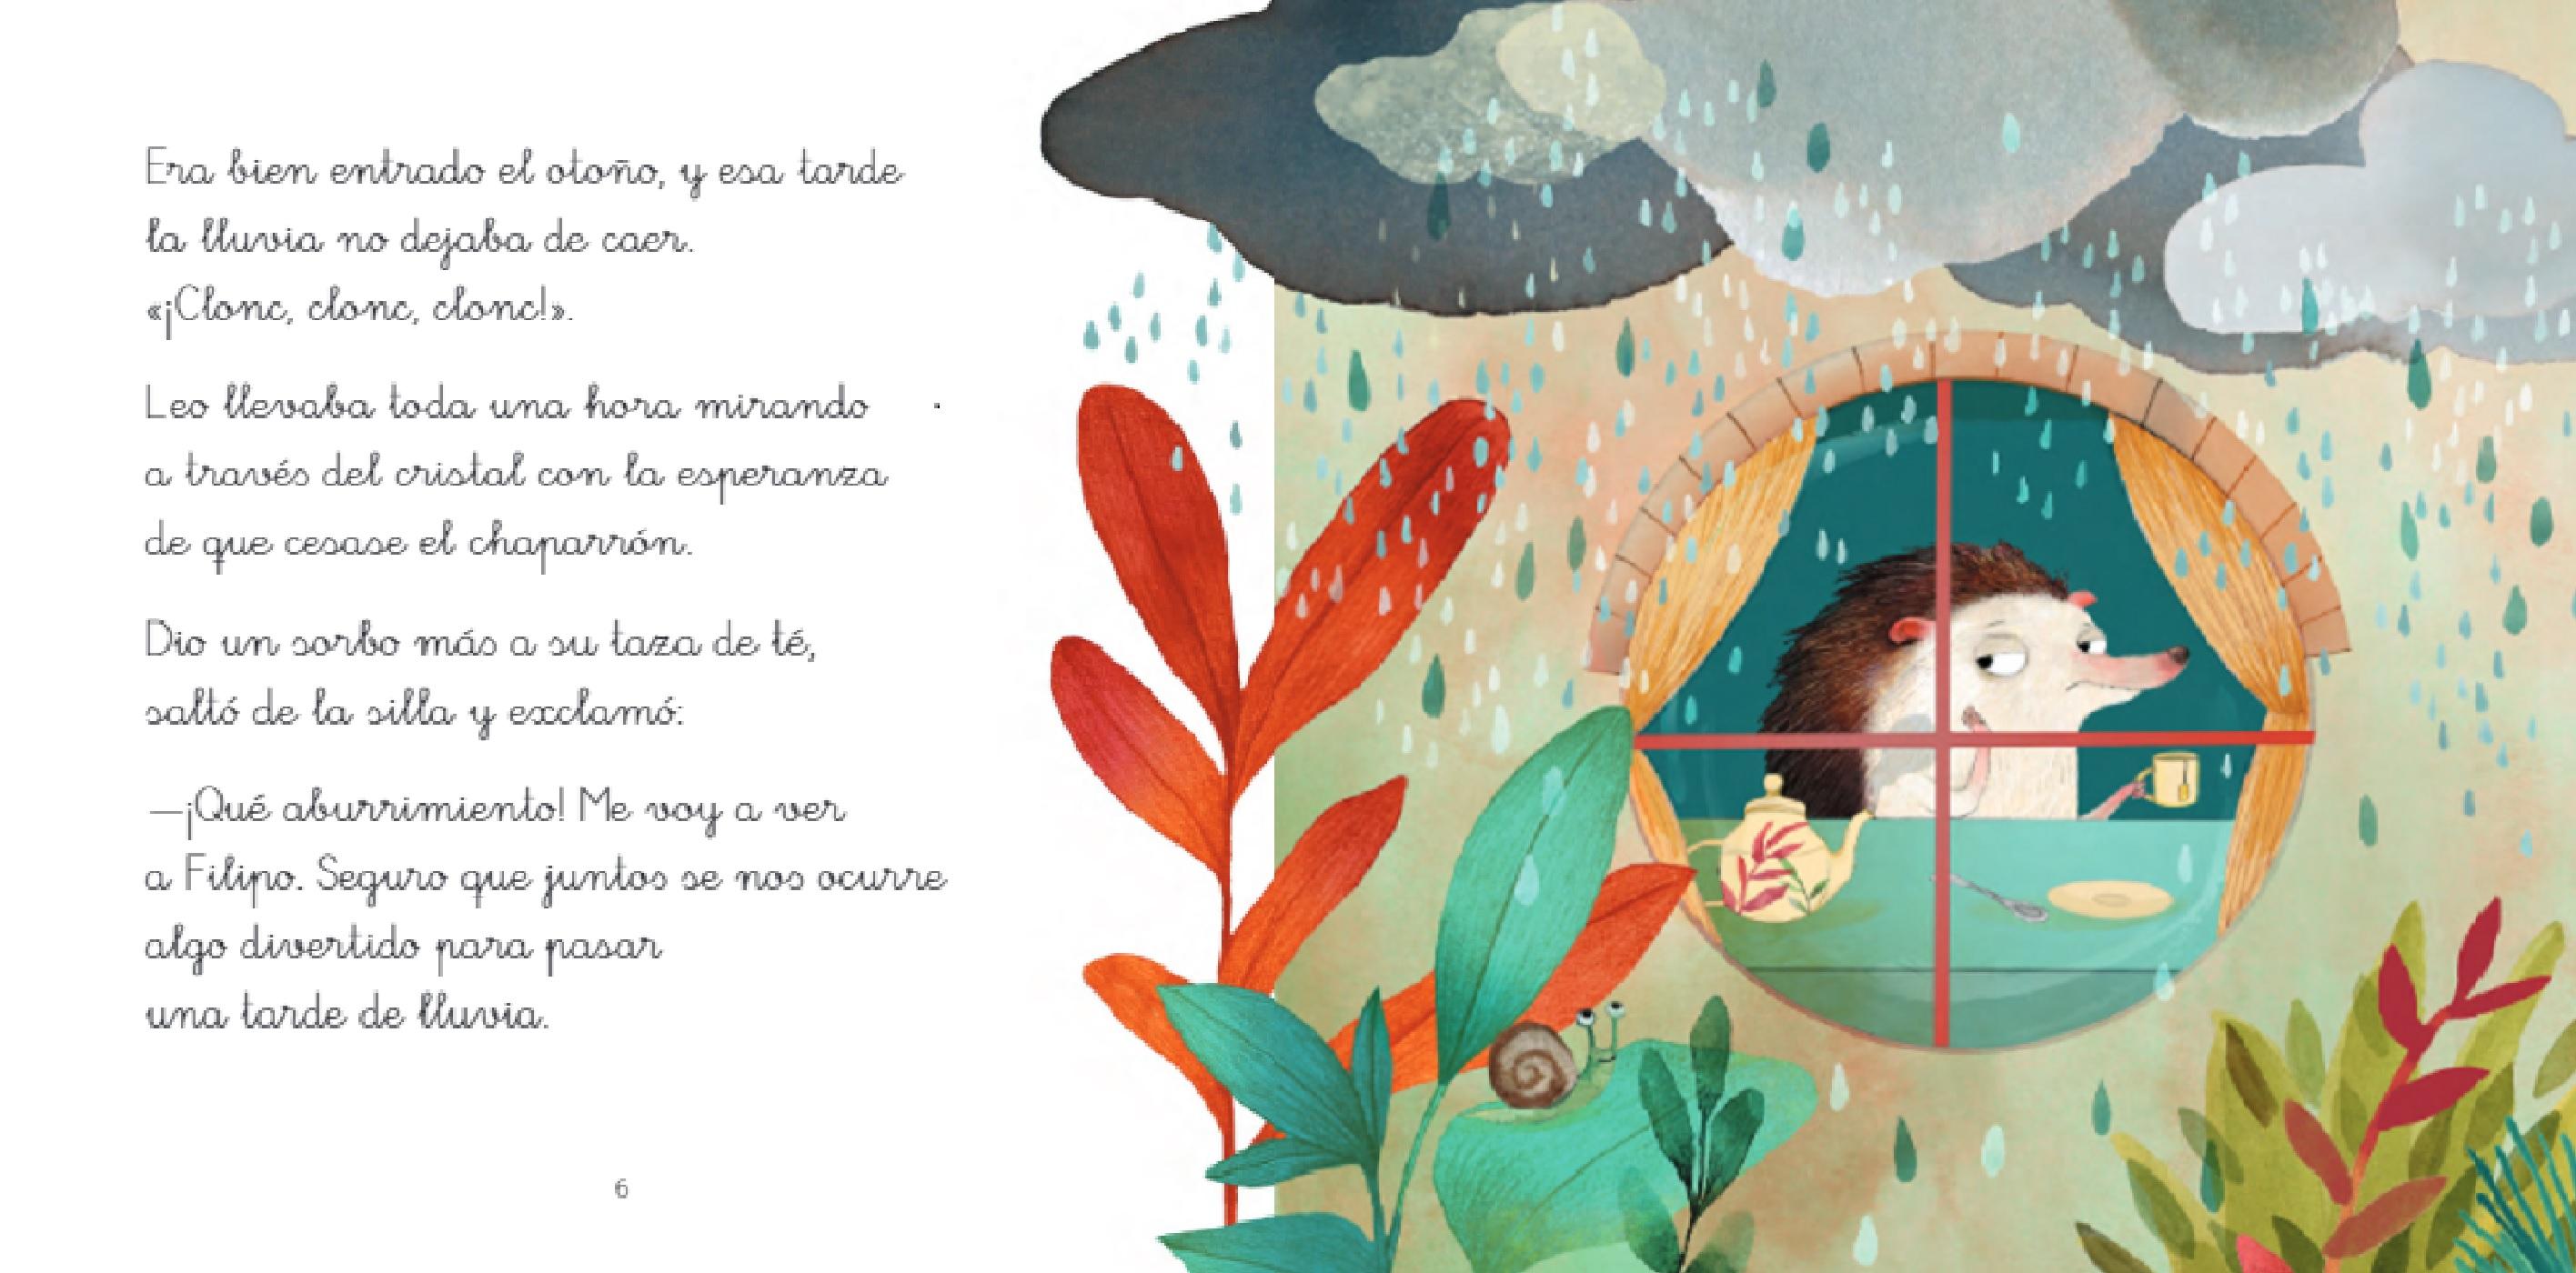 Una tarde de lluvia